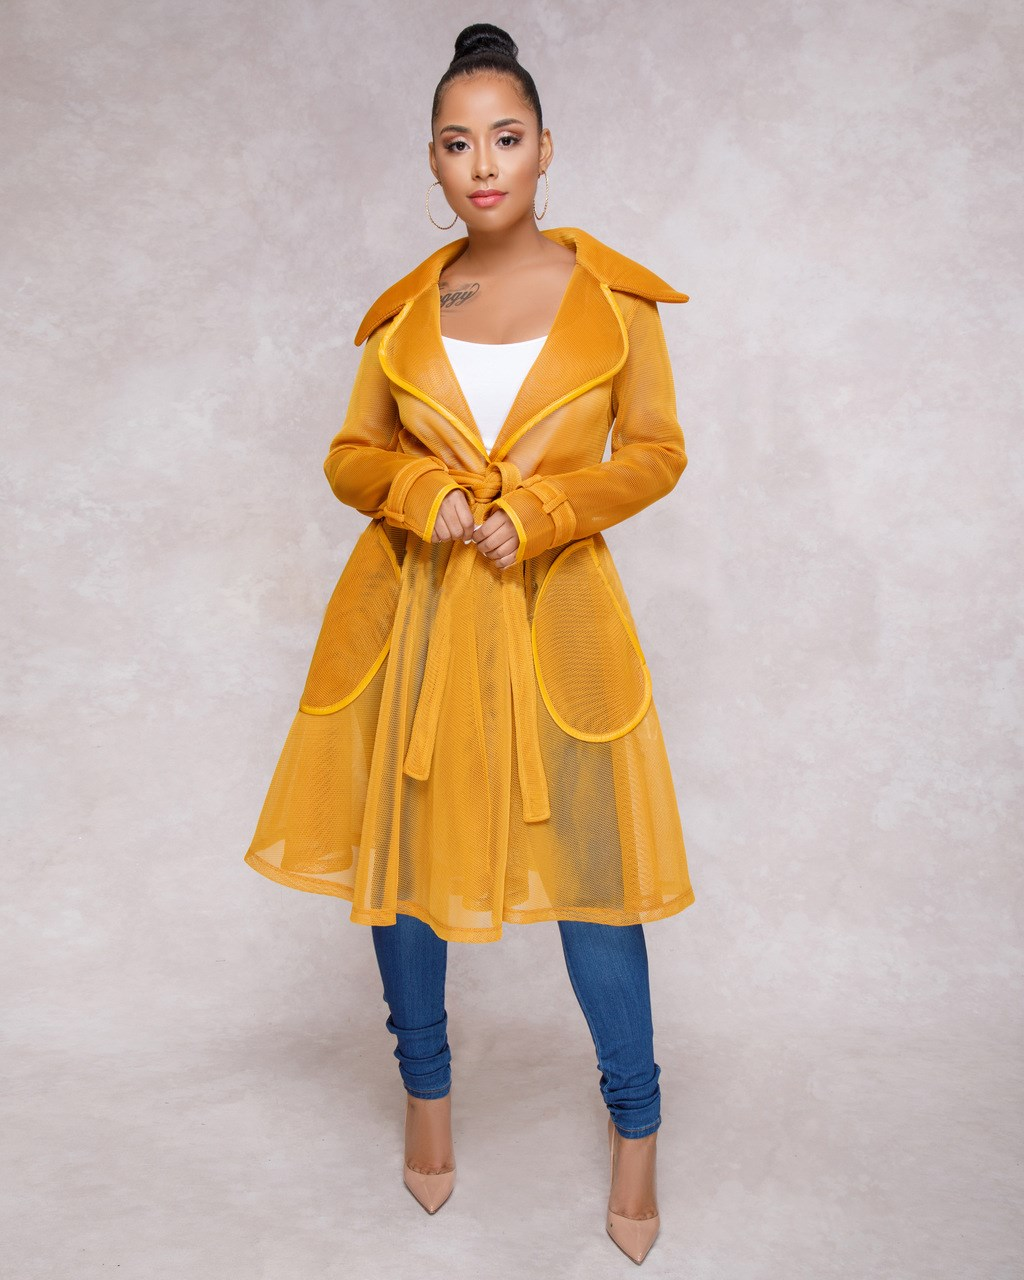 Fashion 2018 Autumn New Transparent Mesh Women   Trench   Coat Fashion Turn Down Collar Loose Coats Casual Belt Long Outerwear